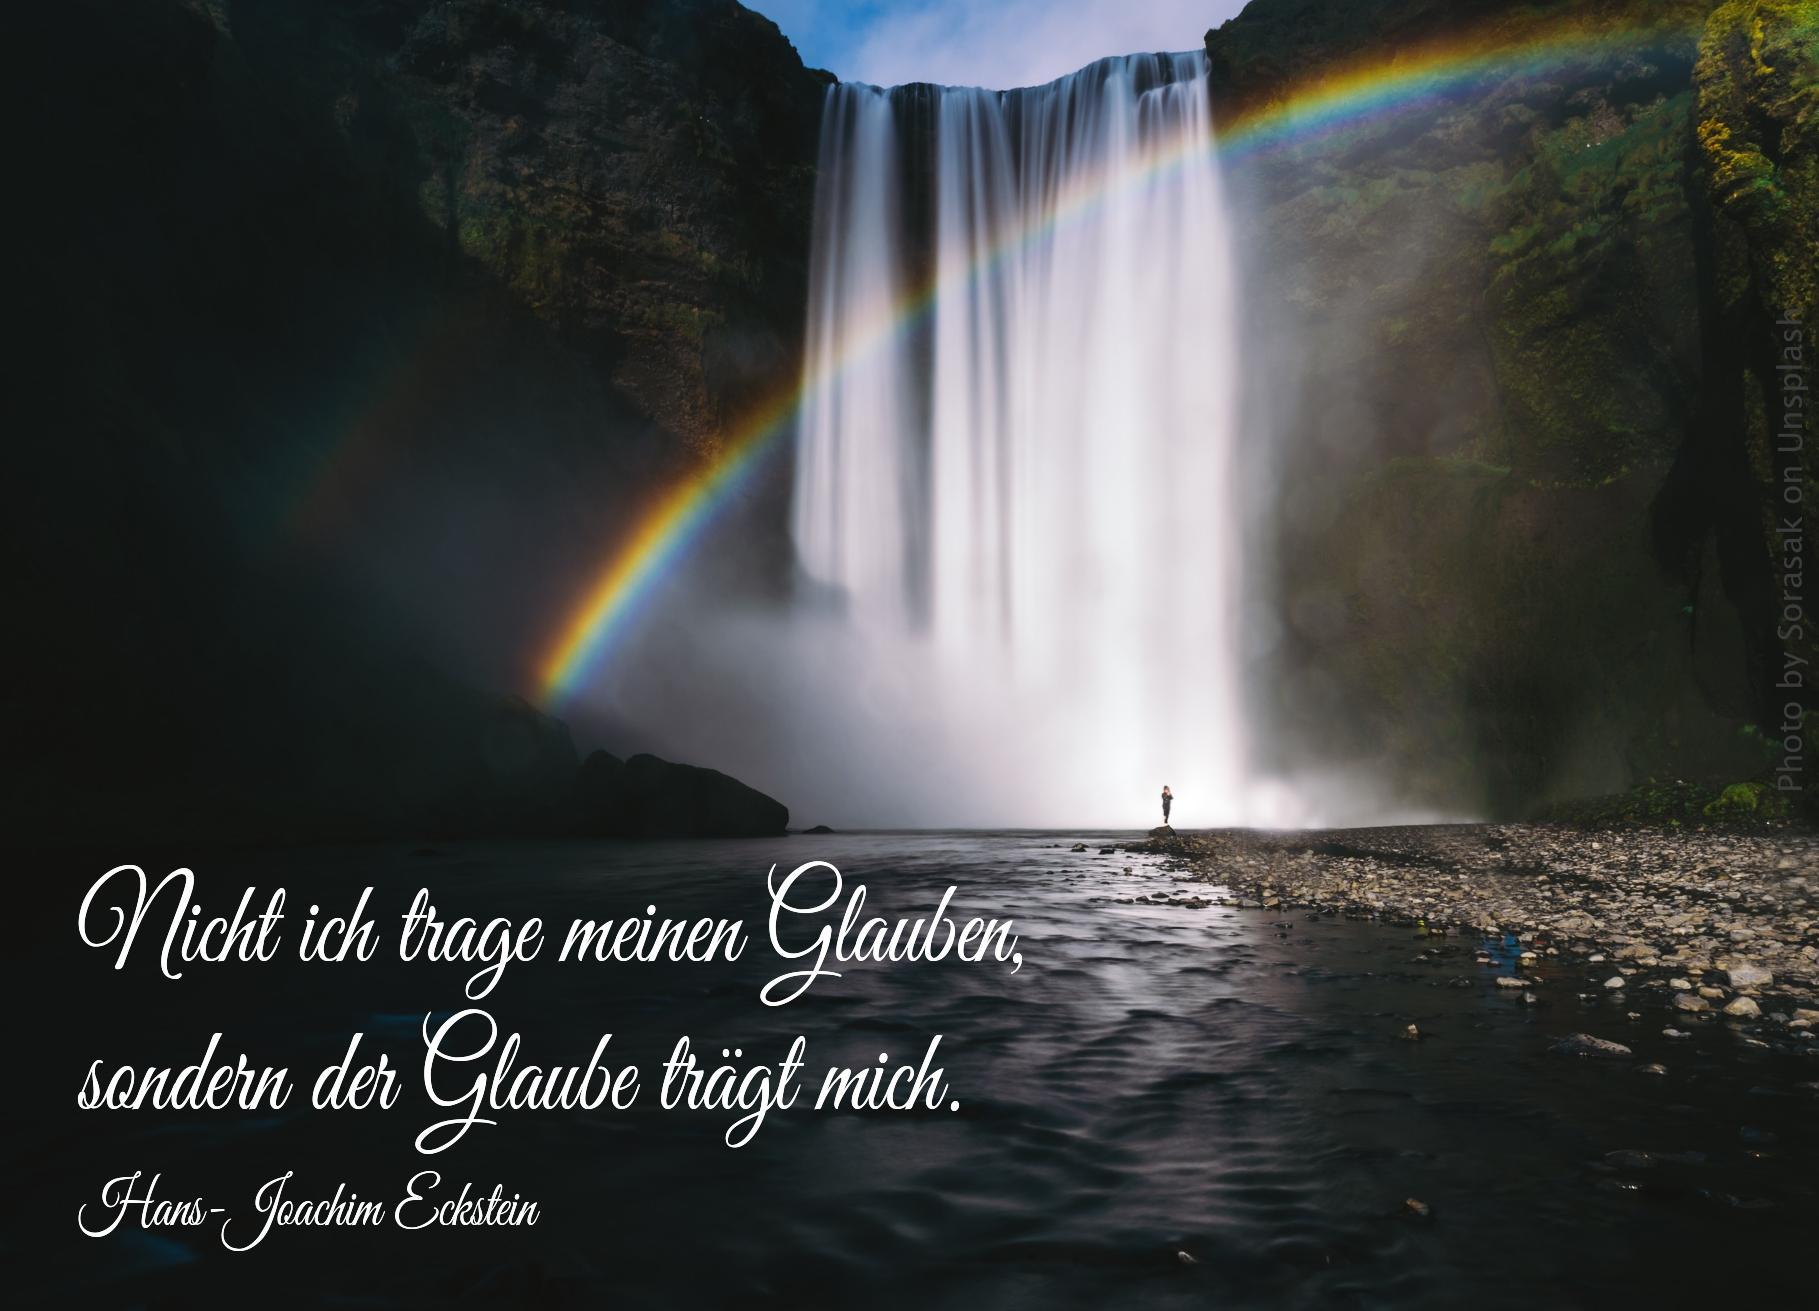 Regenbogen vor großem Wasserfall